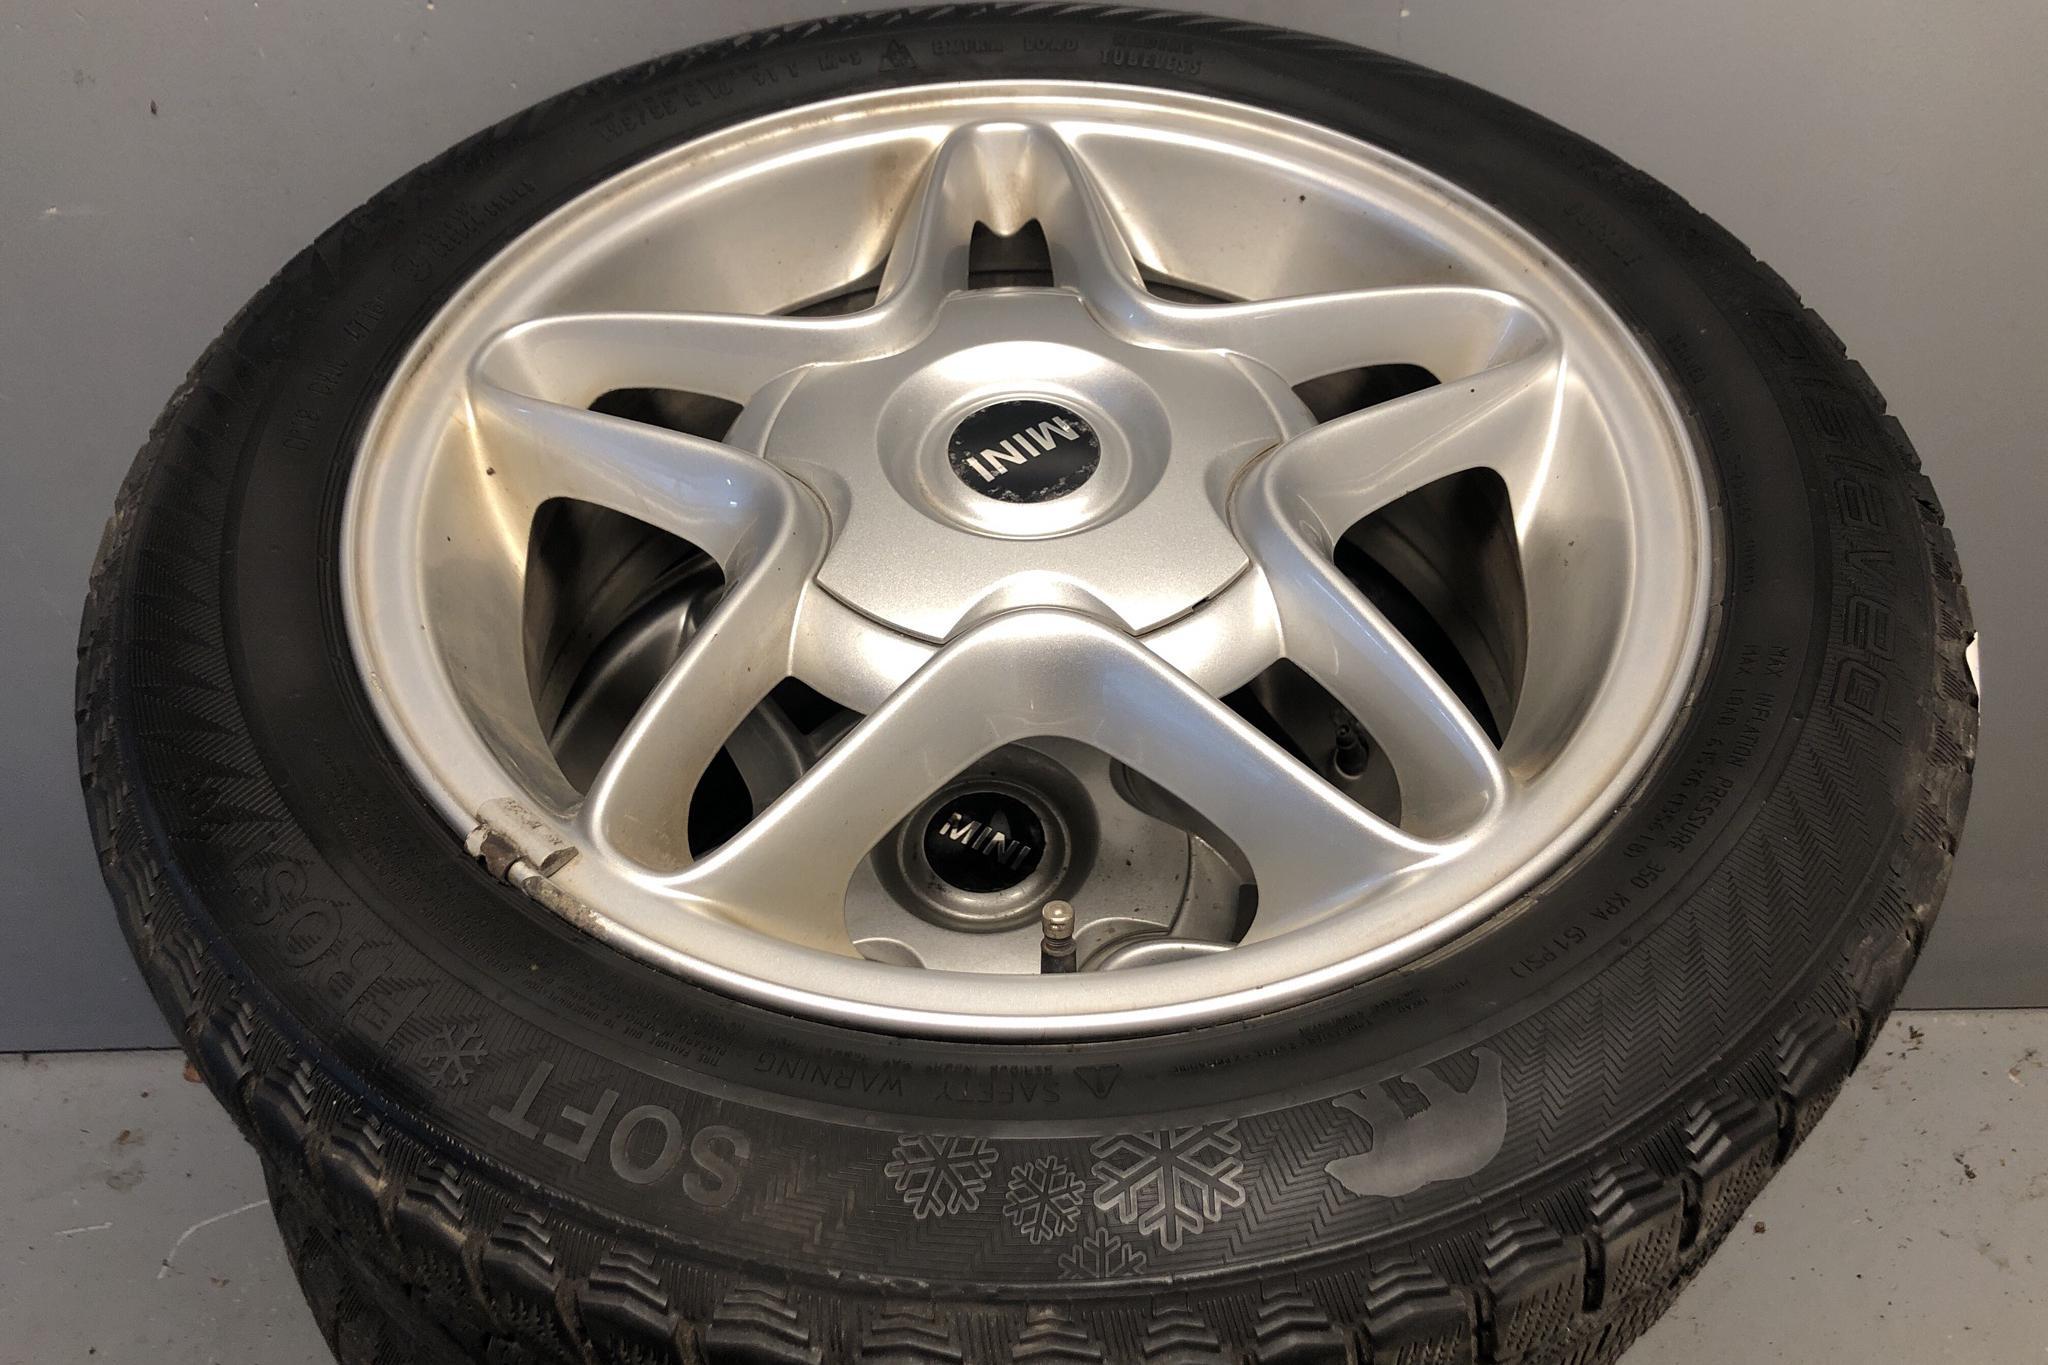 MINI Cooper Clubman 1.6 S (175hk) - 149 430 km - Manual - black - 2010